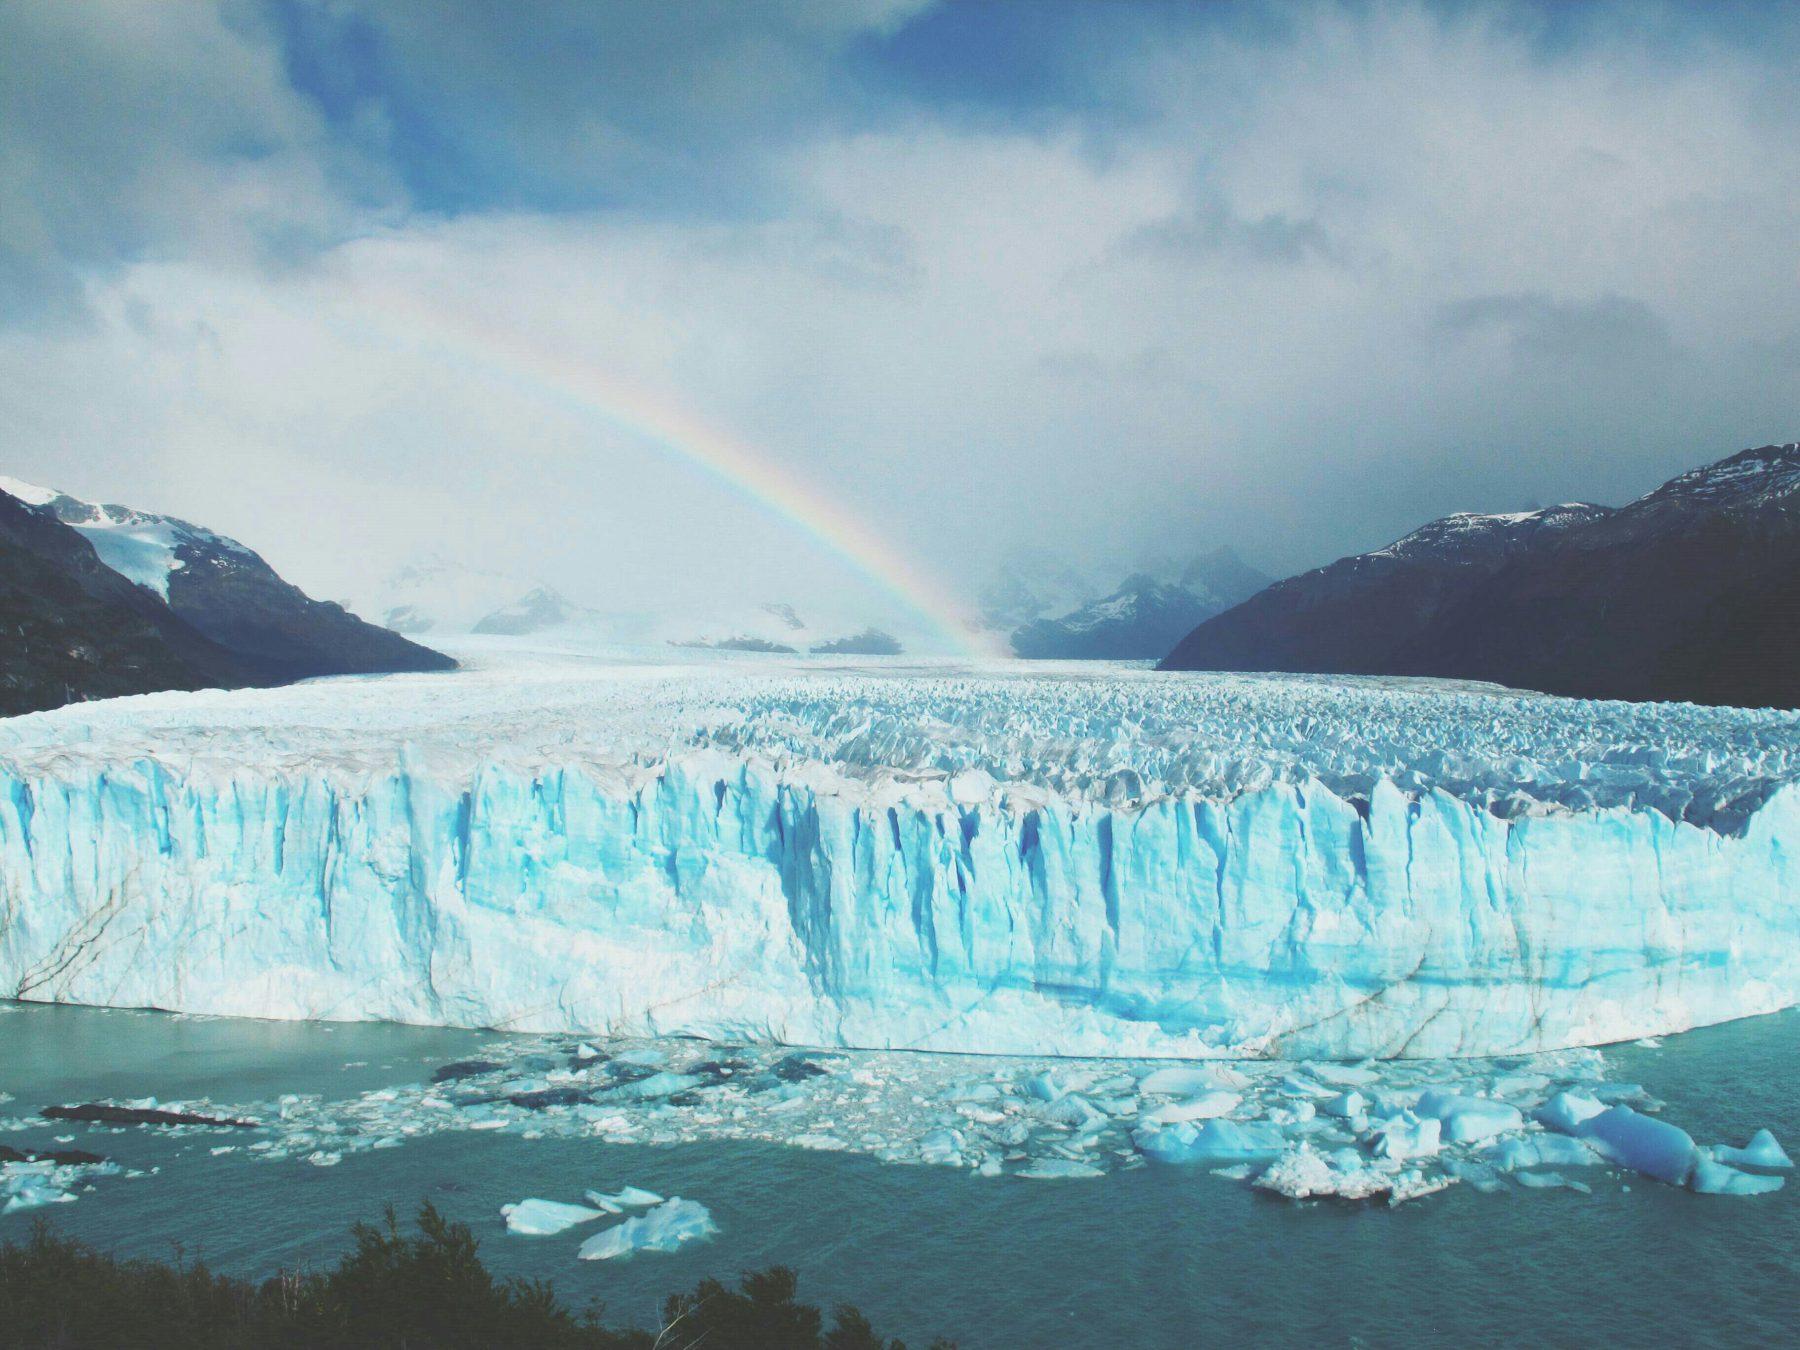 Patagonie Argentine, le glacier Perito Moreno